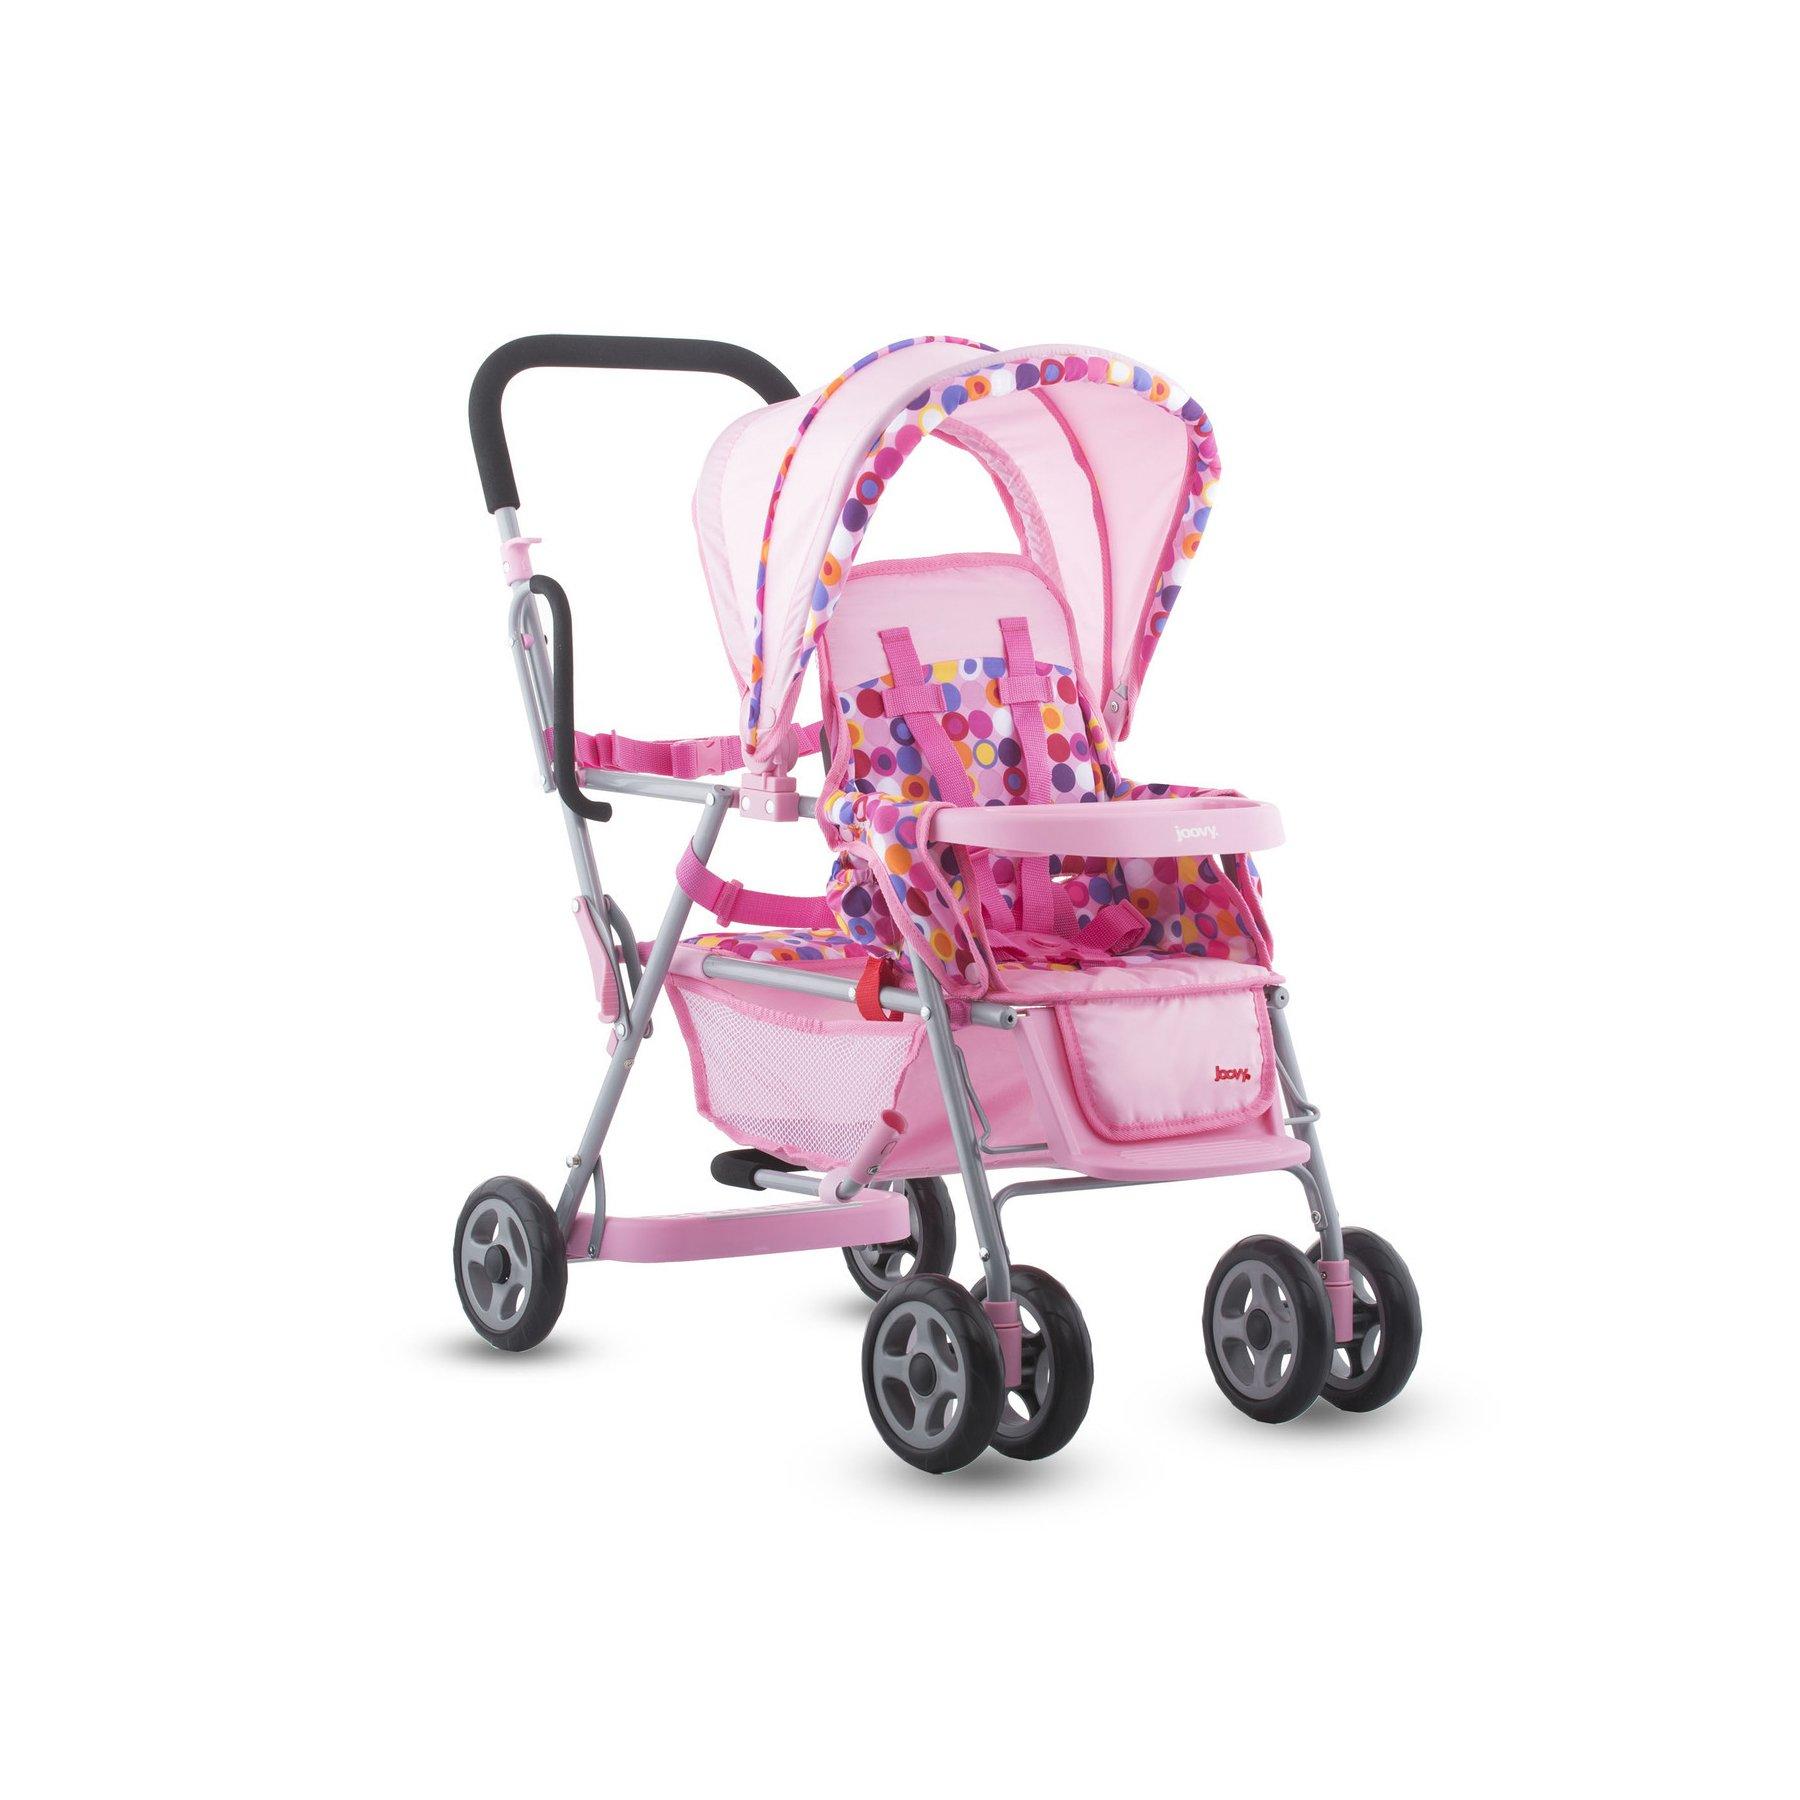 Joovy Toy Doll Caboose Tandem Stroller - Pink Dot